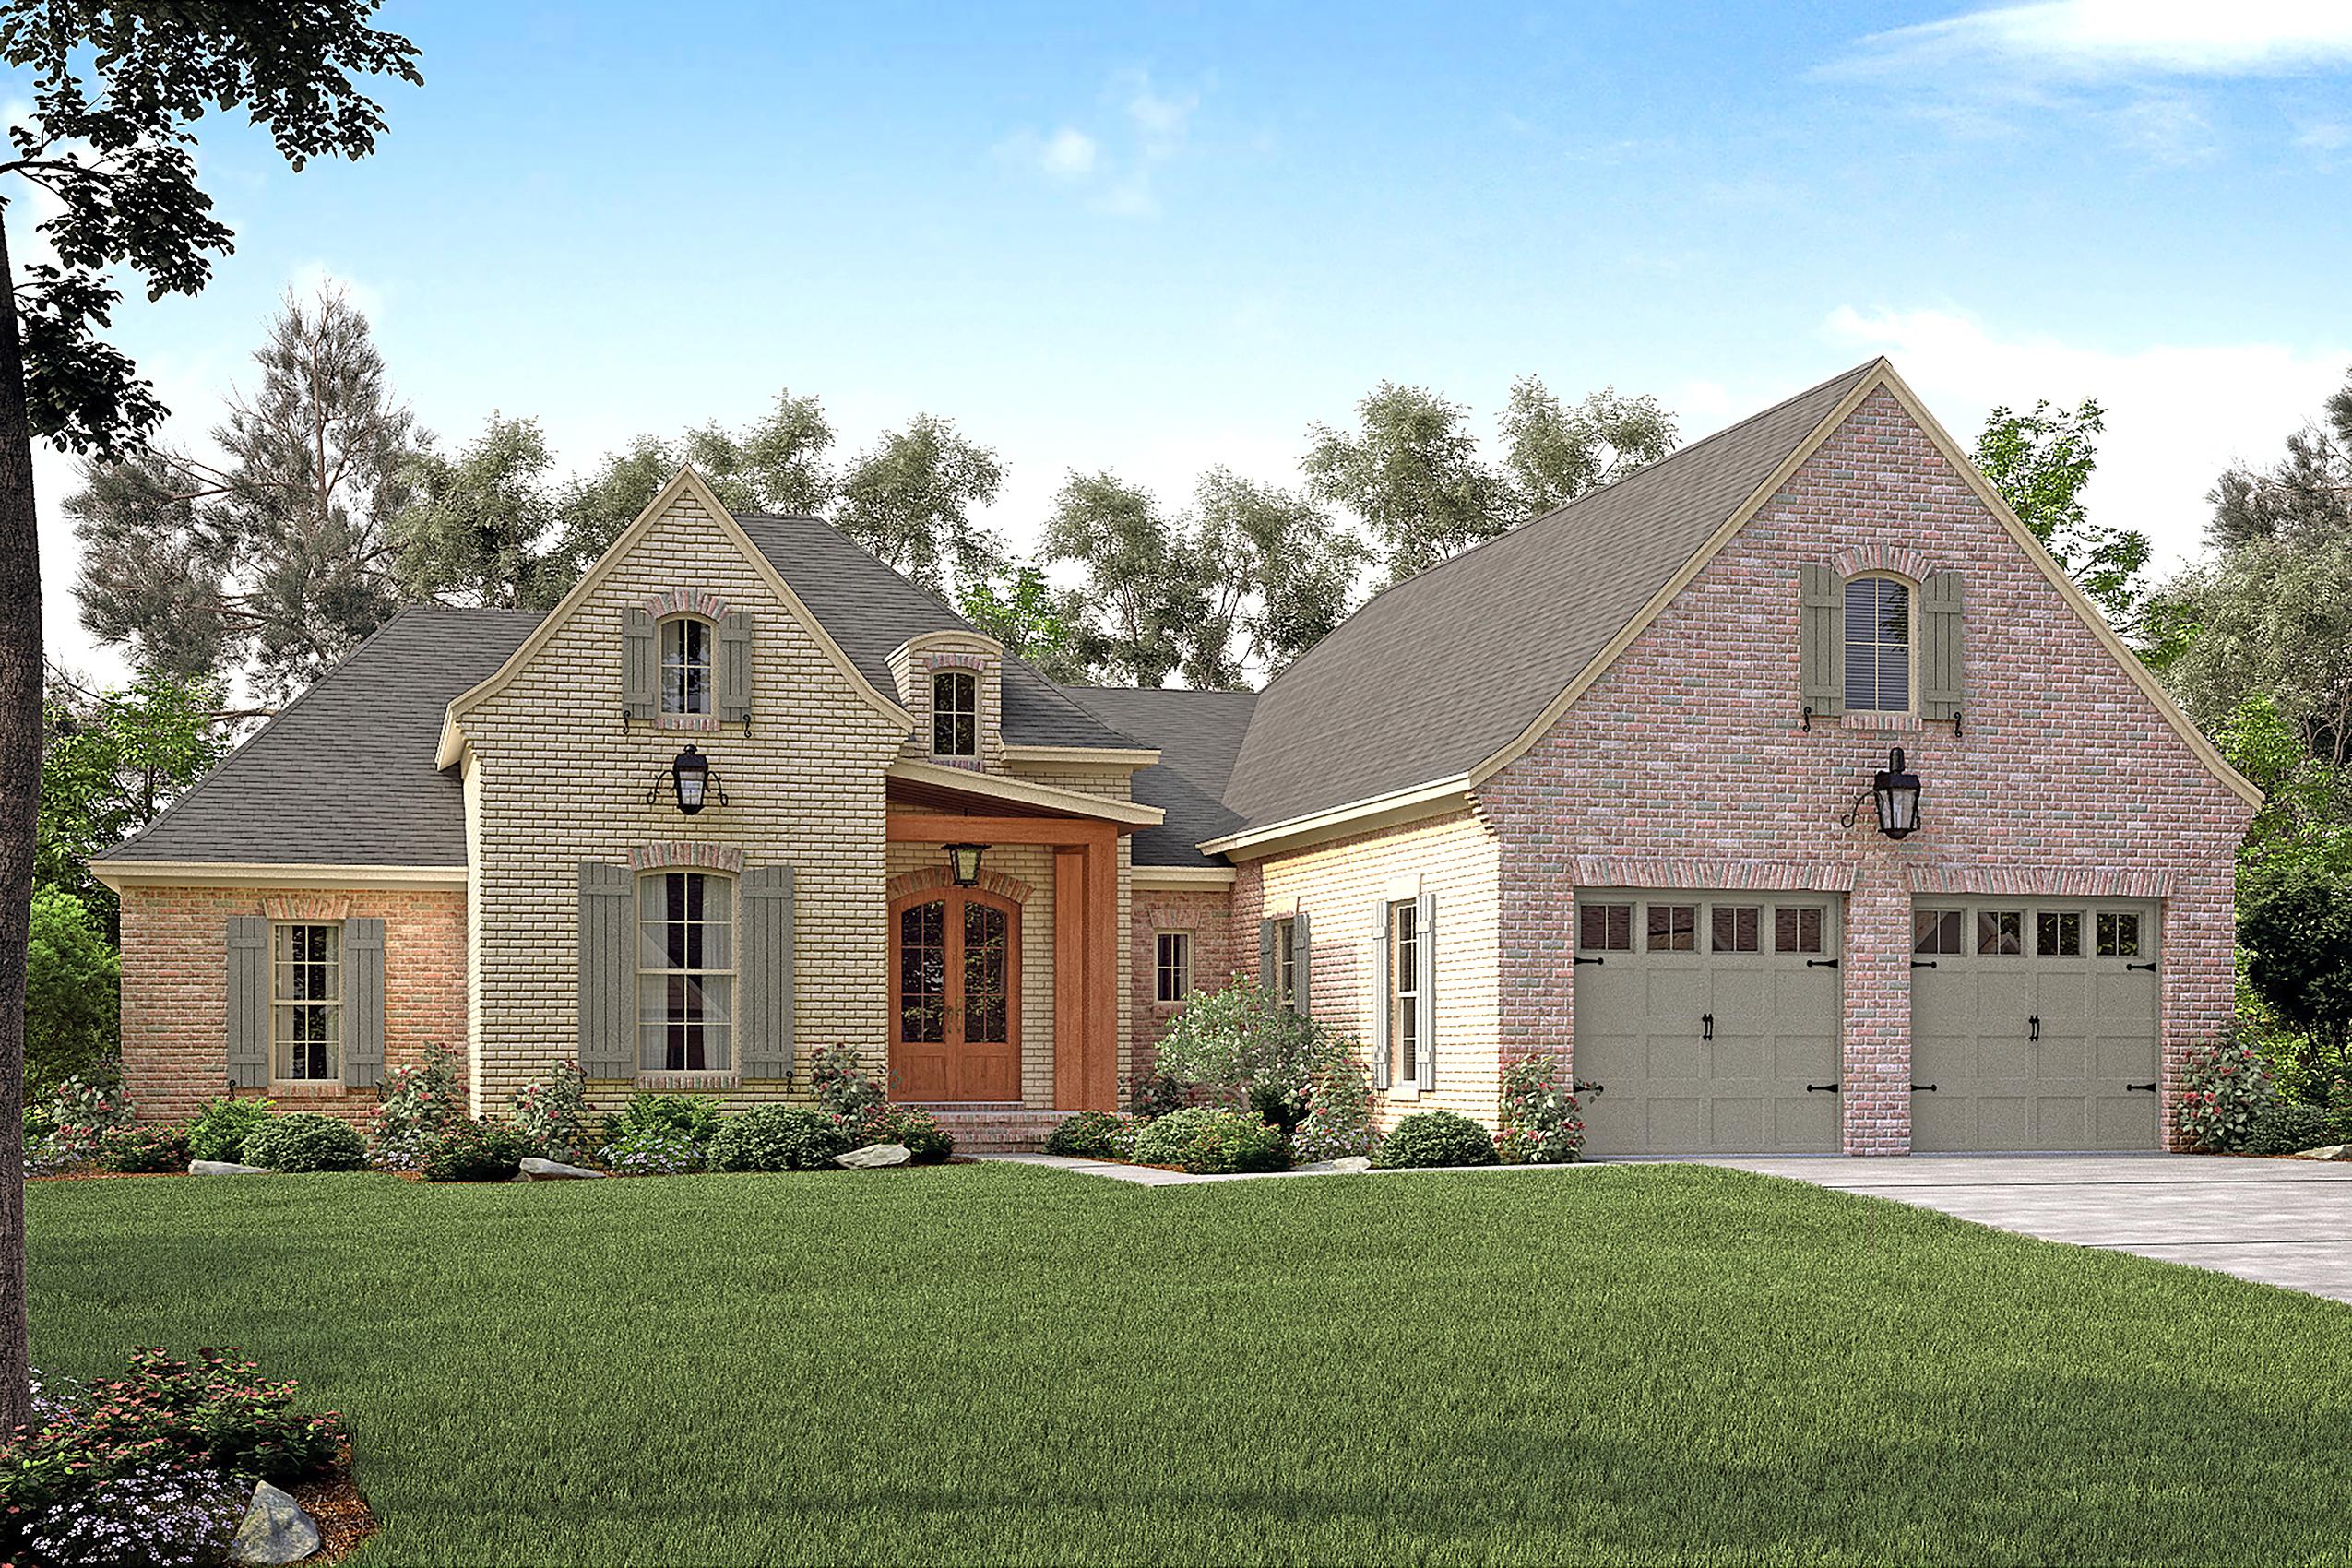 French House Plan 1421149 3 Bedrm 2217 Sq Ft Home Plan  TPC